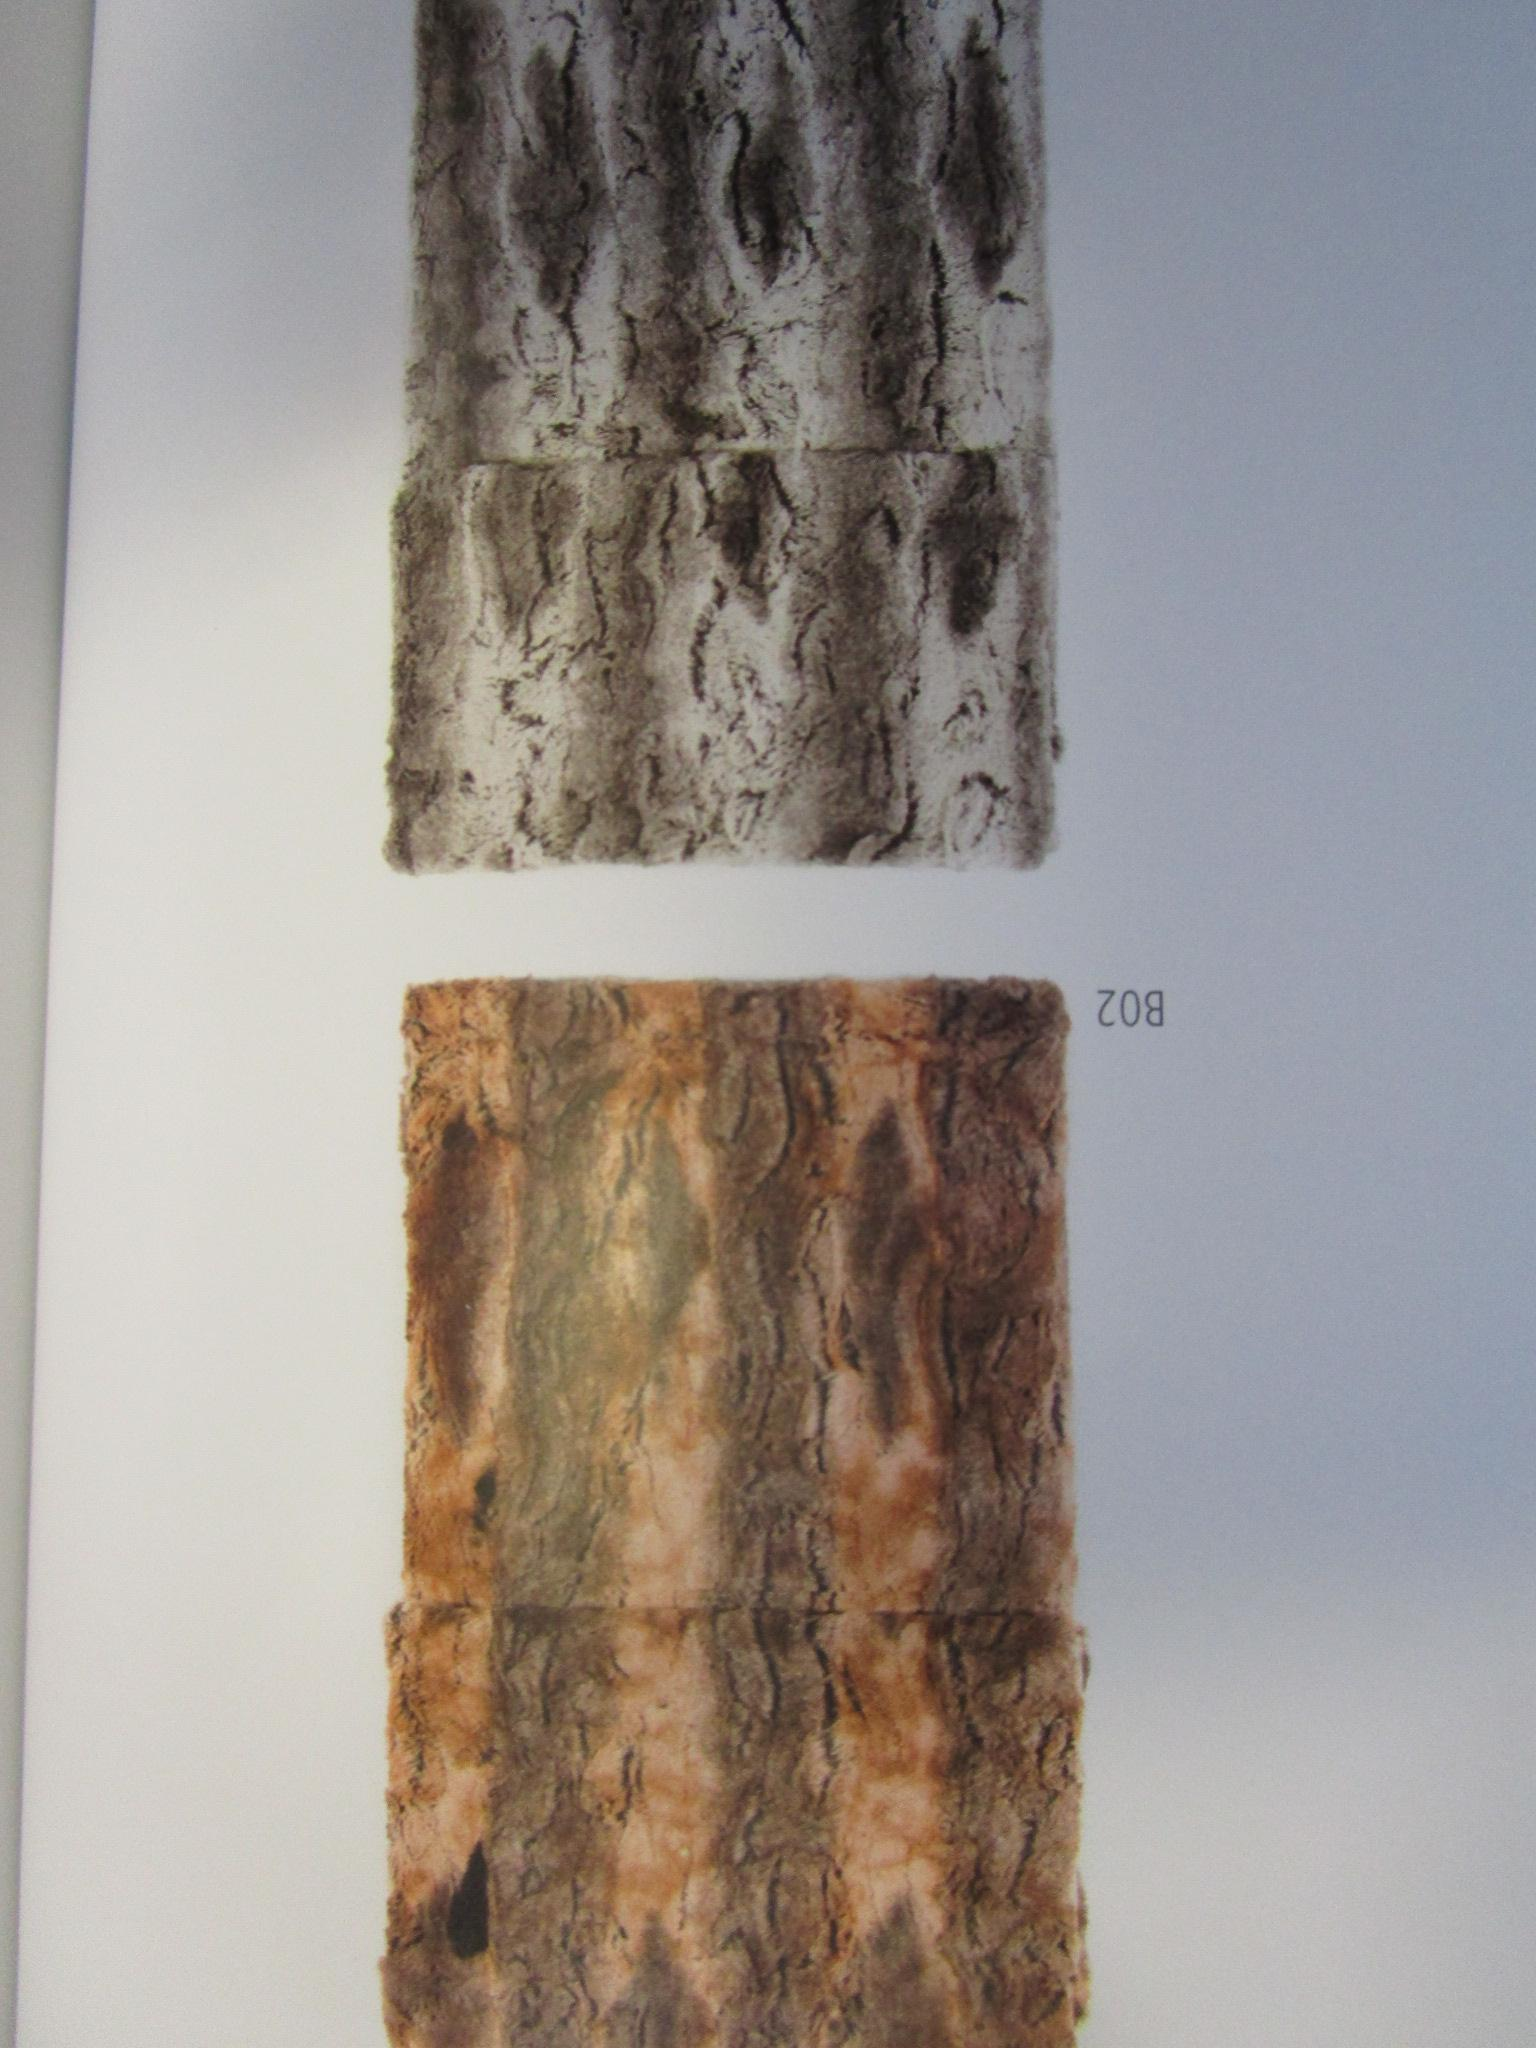 sofakissen h lle fellkissen imitat monroe kuschelkissen uni 50x50 cm farbe grau anthrazit. Black Bedroom Furniture Sets. Home Design Ideas